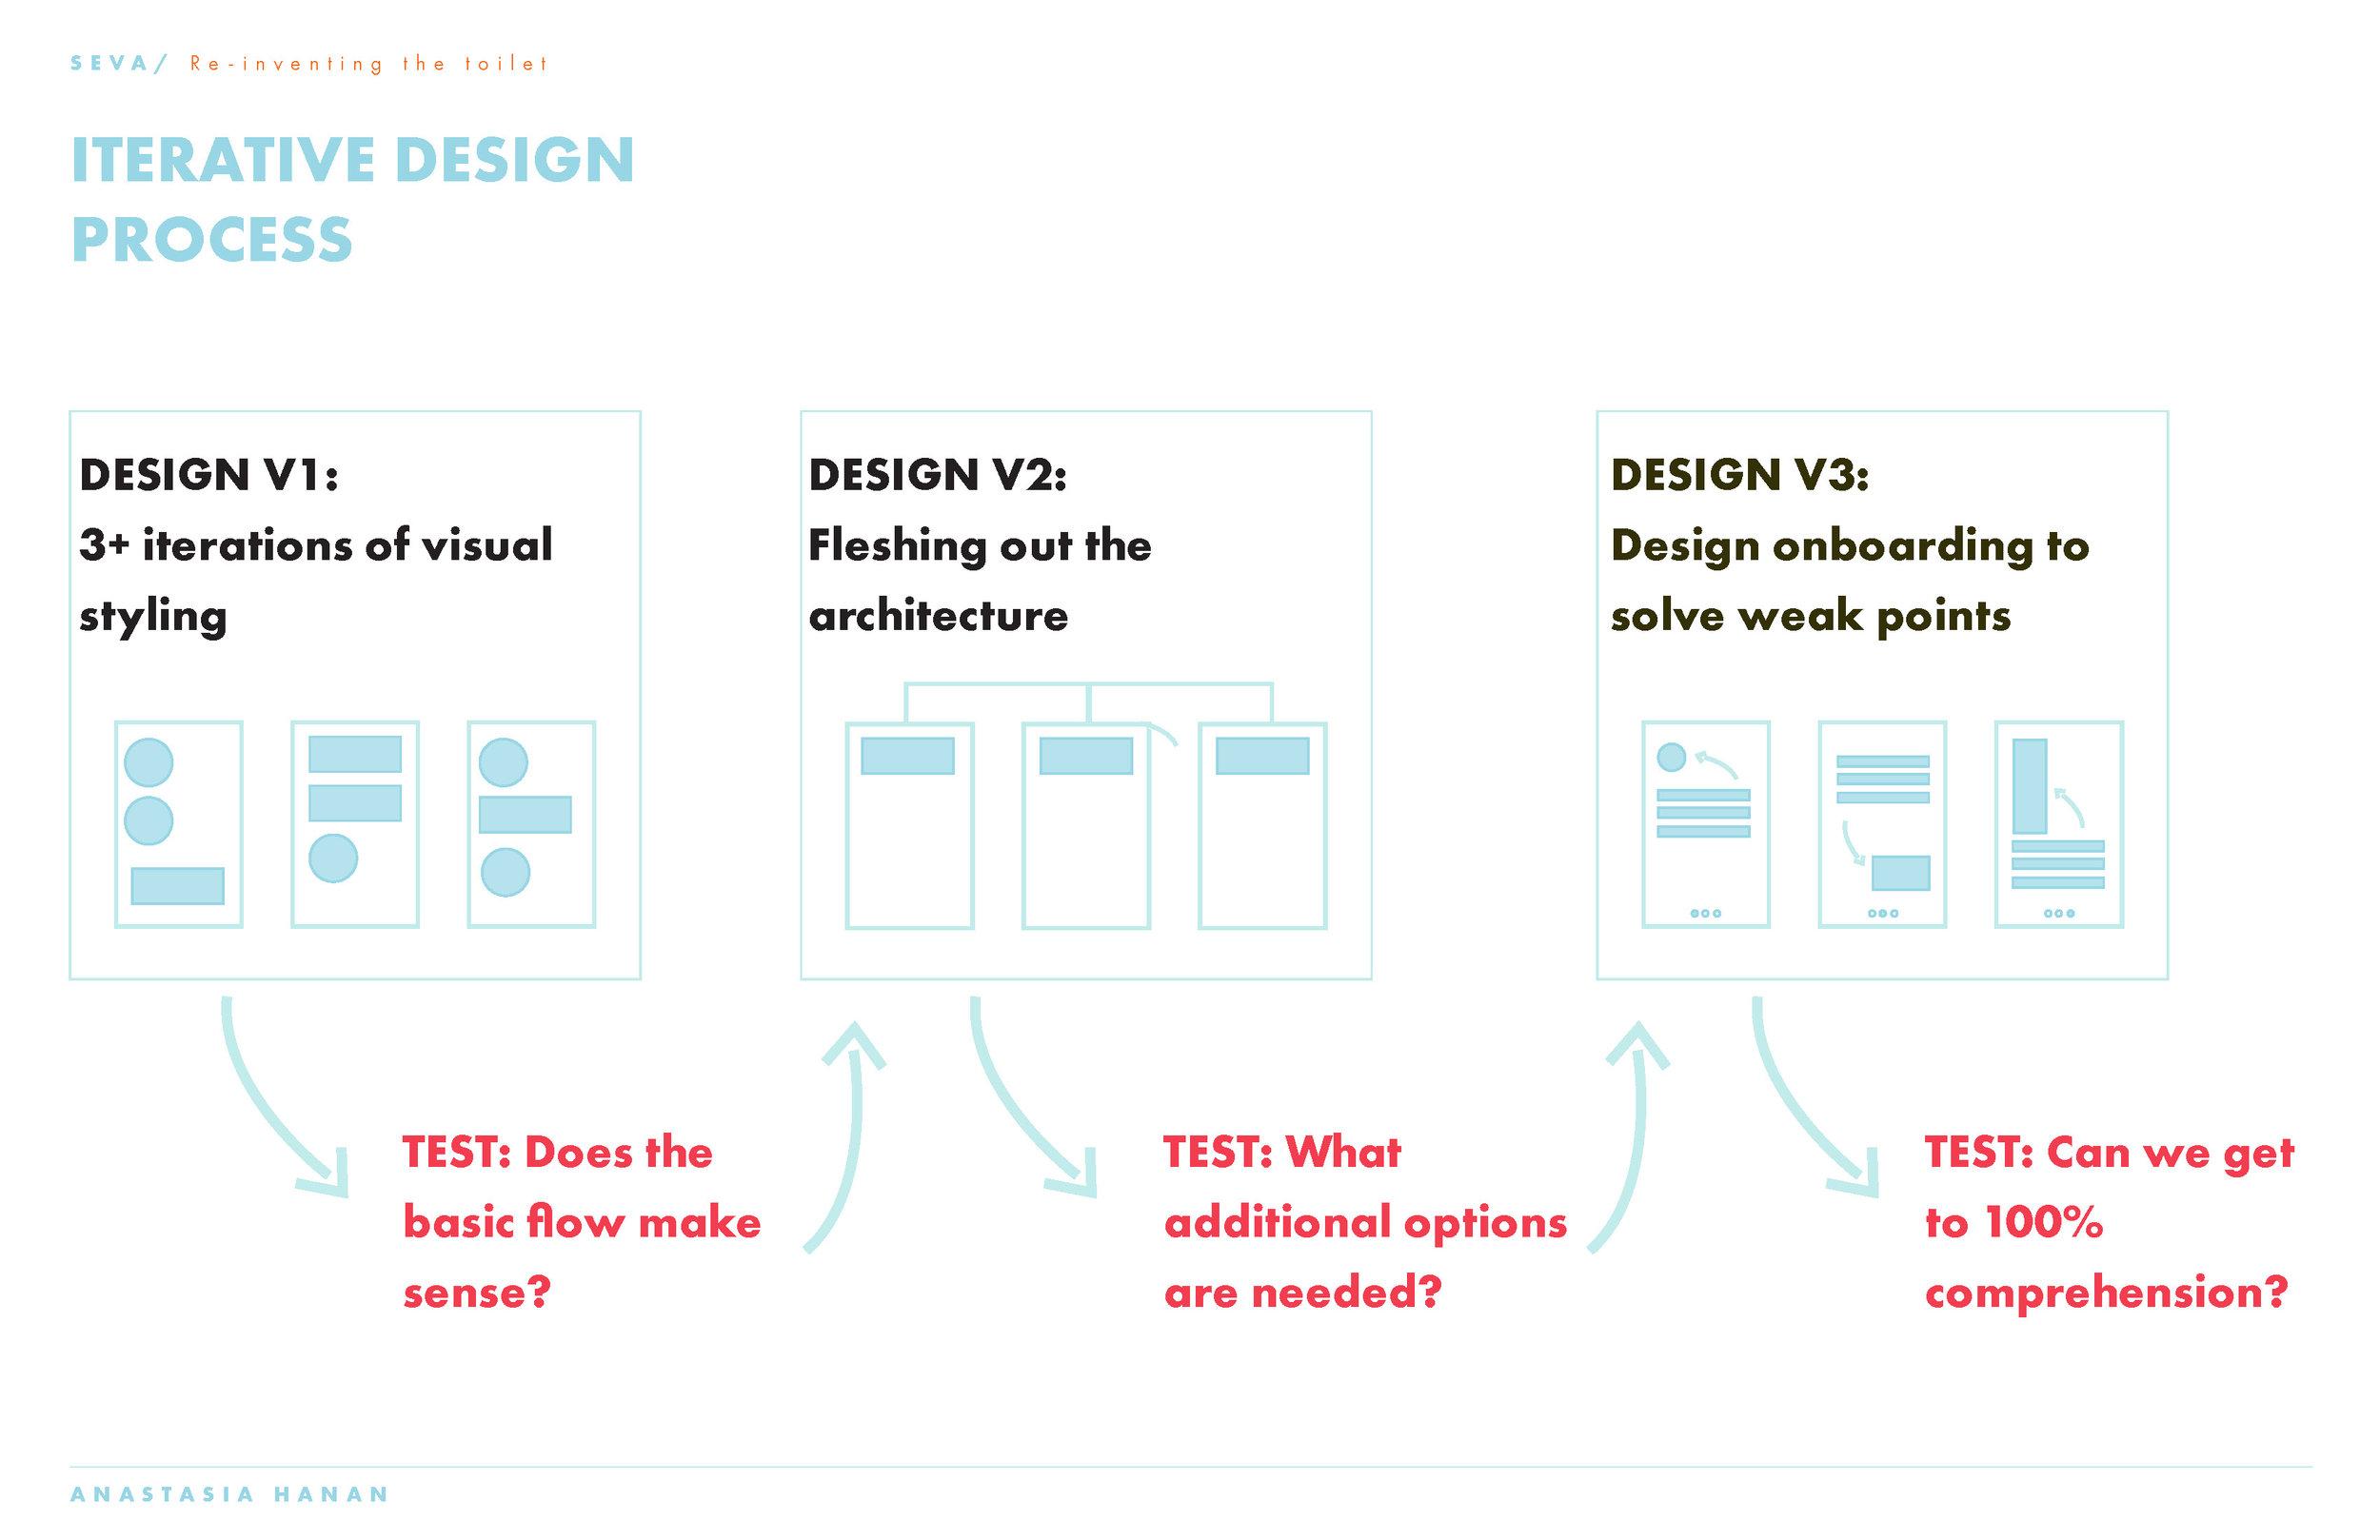 SEVA_toilets_processfinalV2_Page_33.jpg